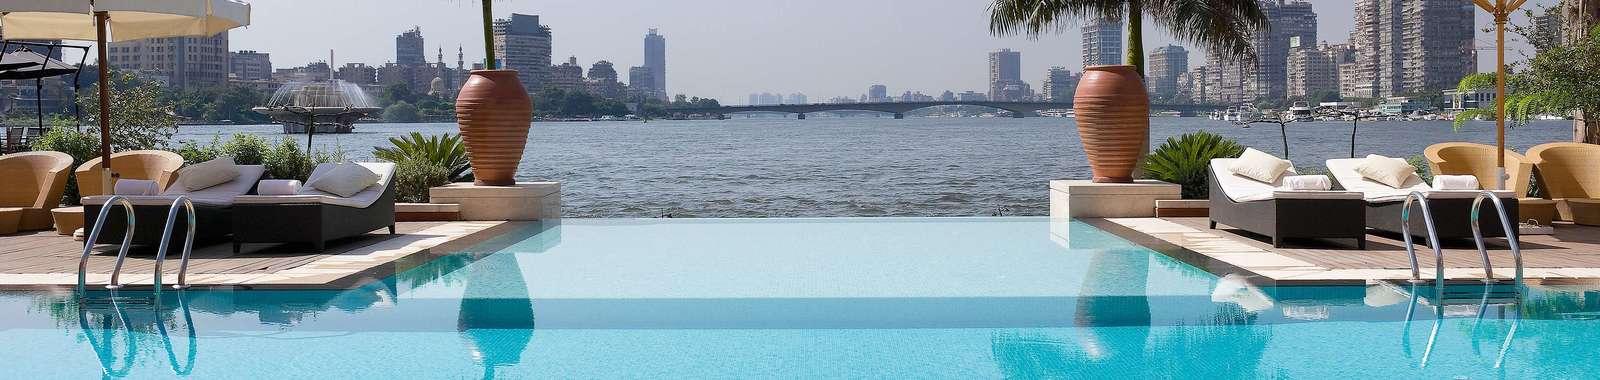 Cairo_Sofitel_Pool_Nile_view